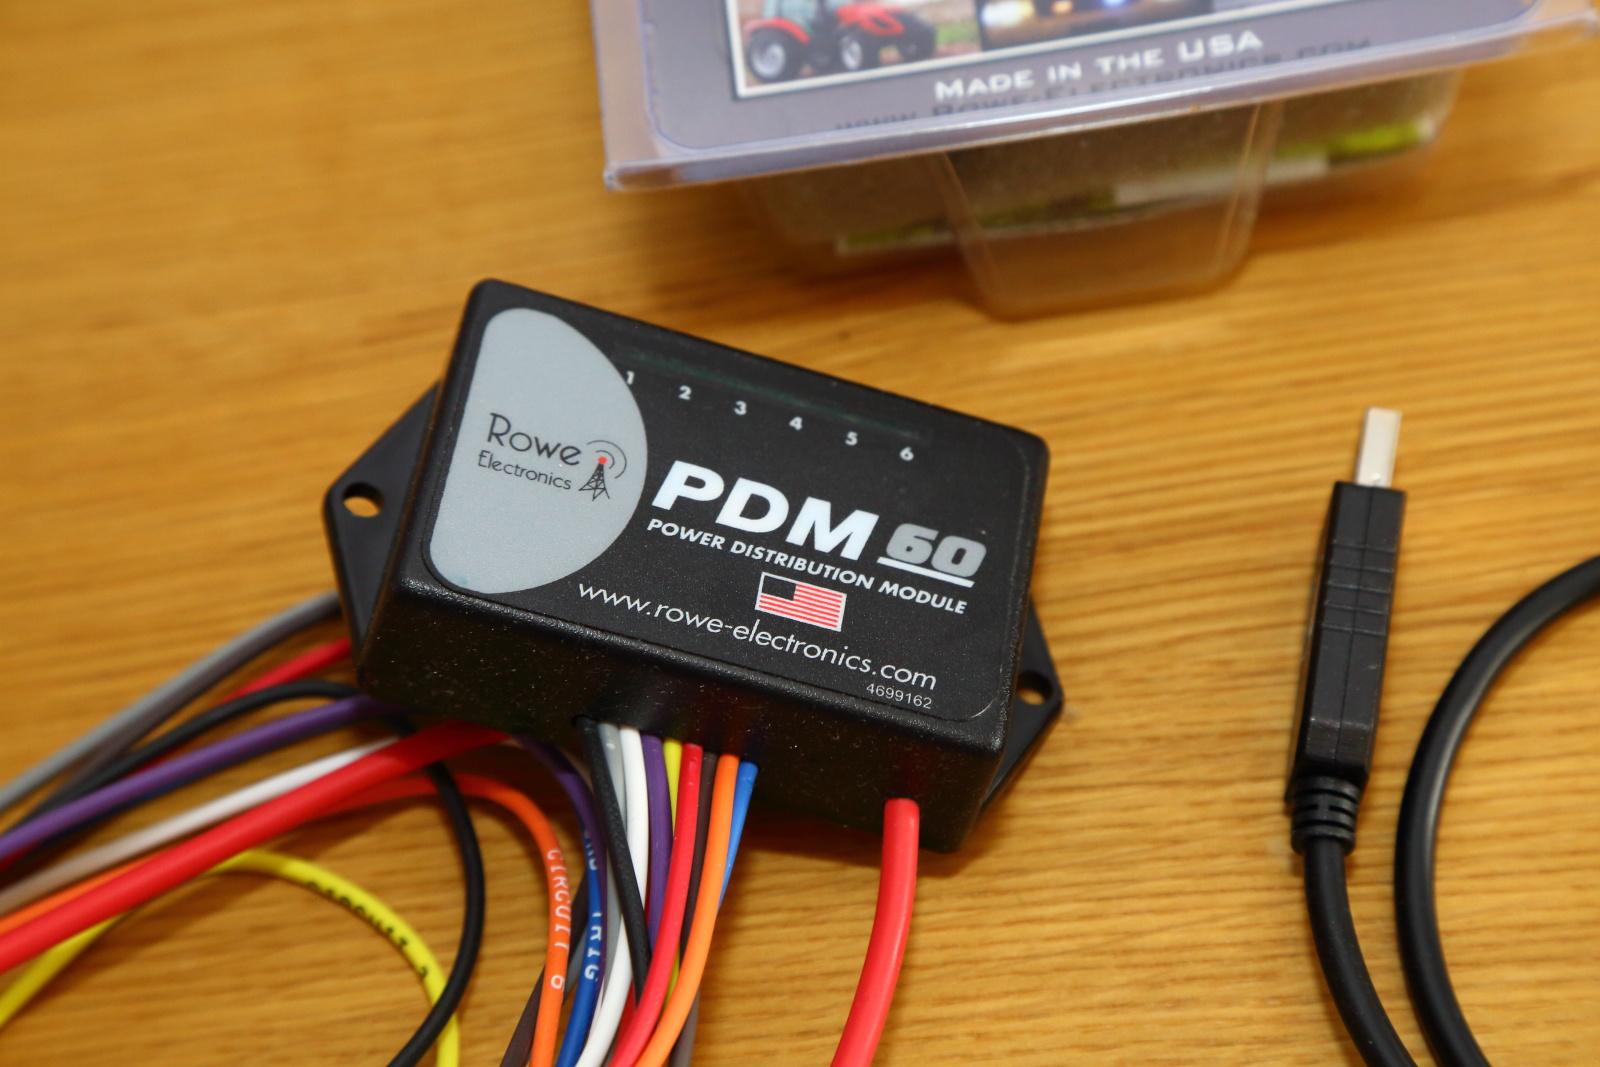 Rowe Electronics PDM 60 power distribution module